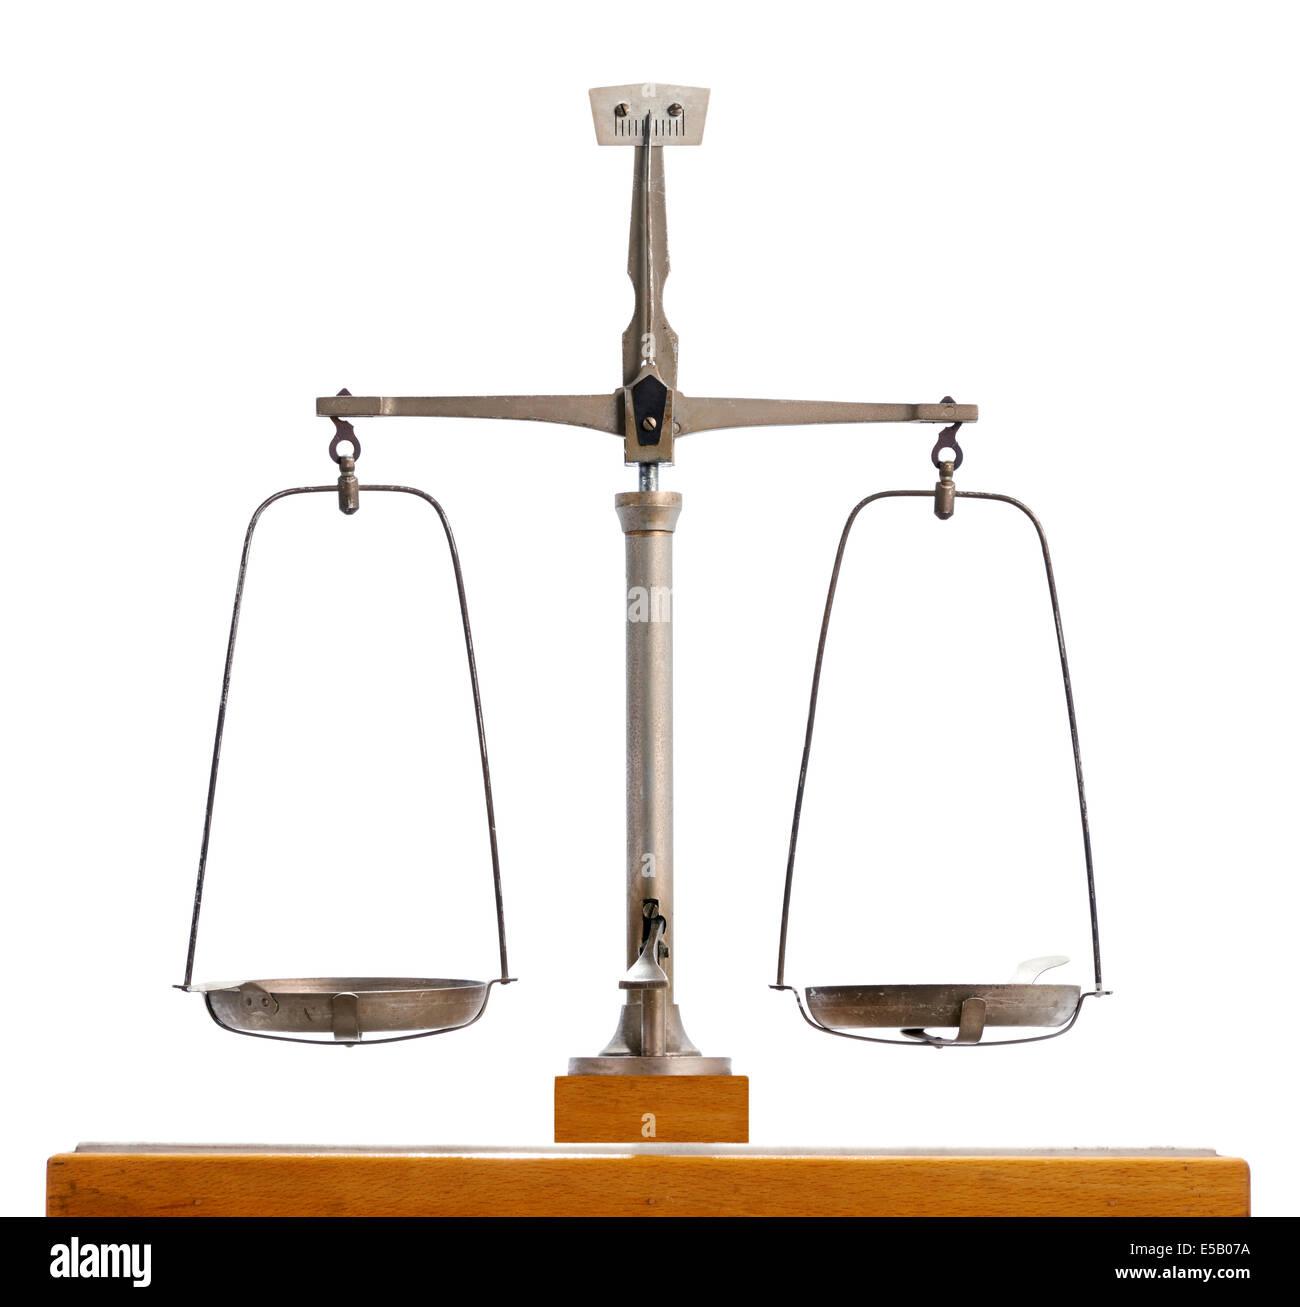 Vintage pendulum scale - Stock Image